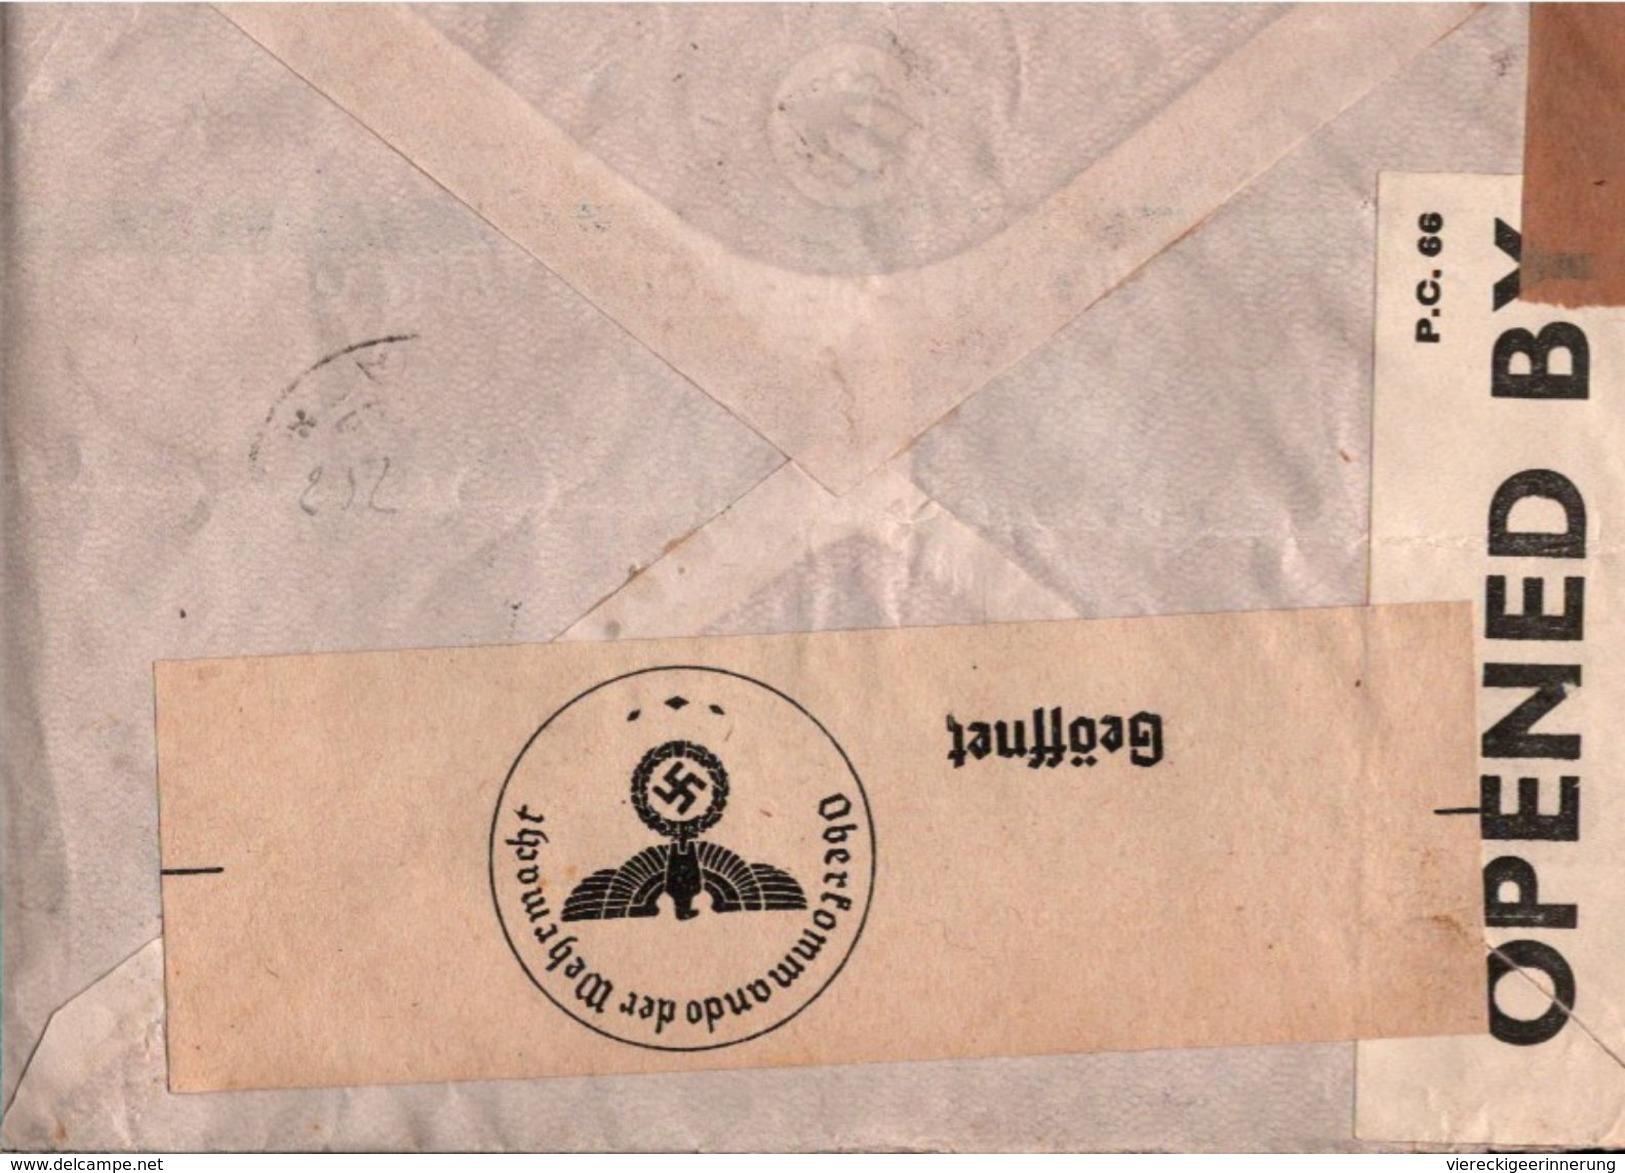 ! Old Airmail Cover 1940 Colombia, Kolumbien Bogota To Hamburg, Par Avion Flugpost, Poste Aerienne, Correo Aereo, Censor - Colombie